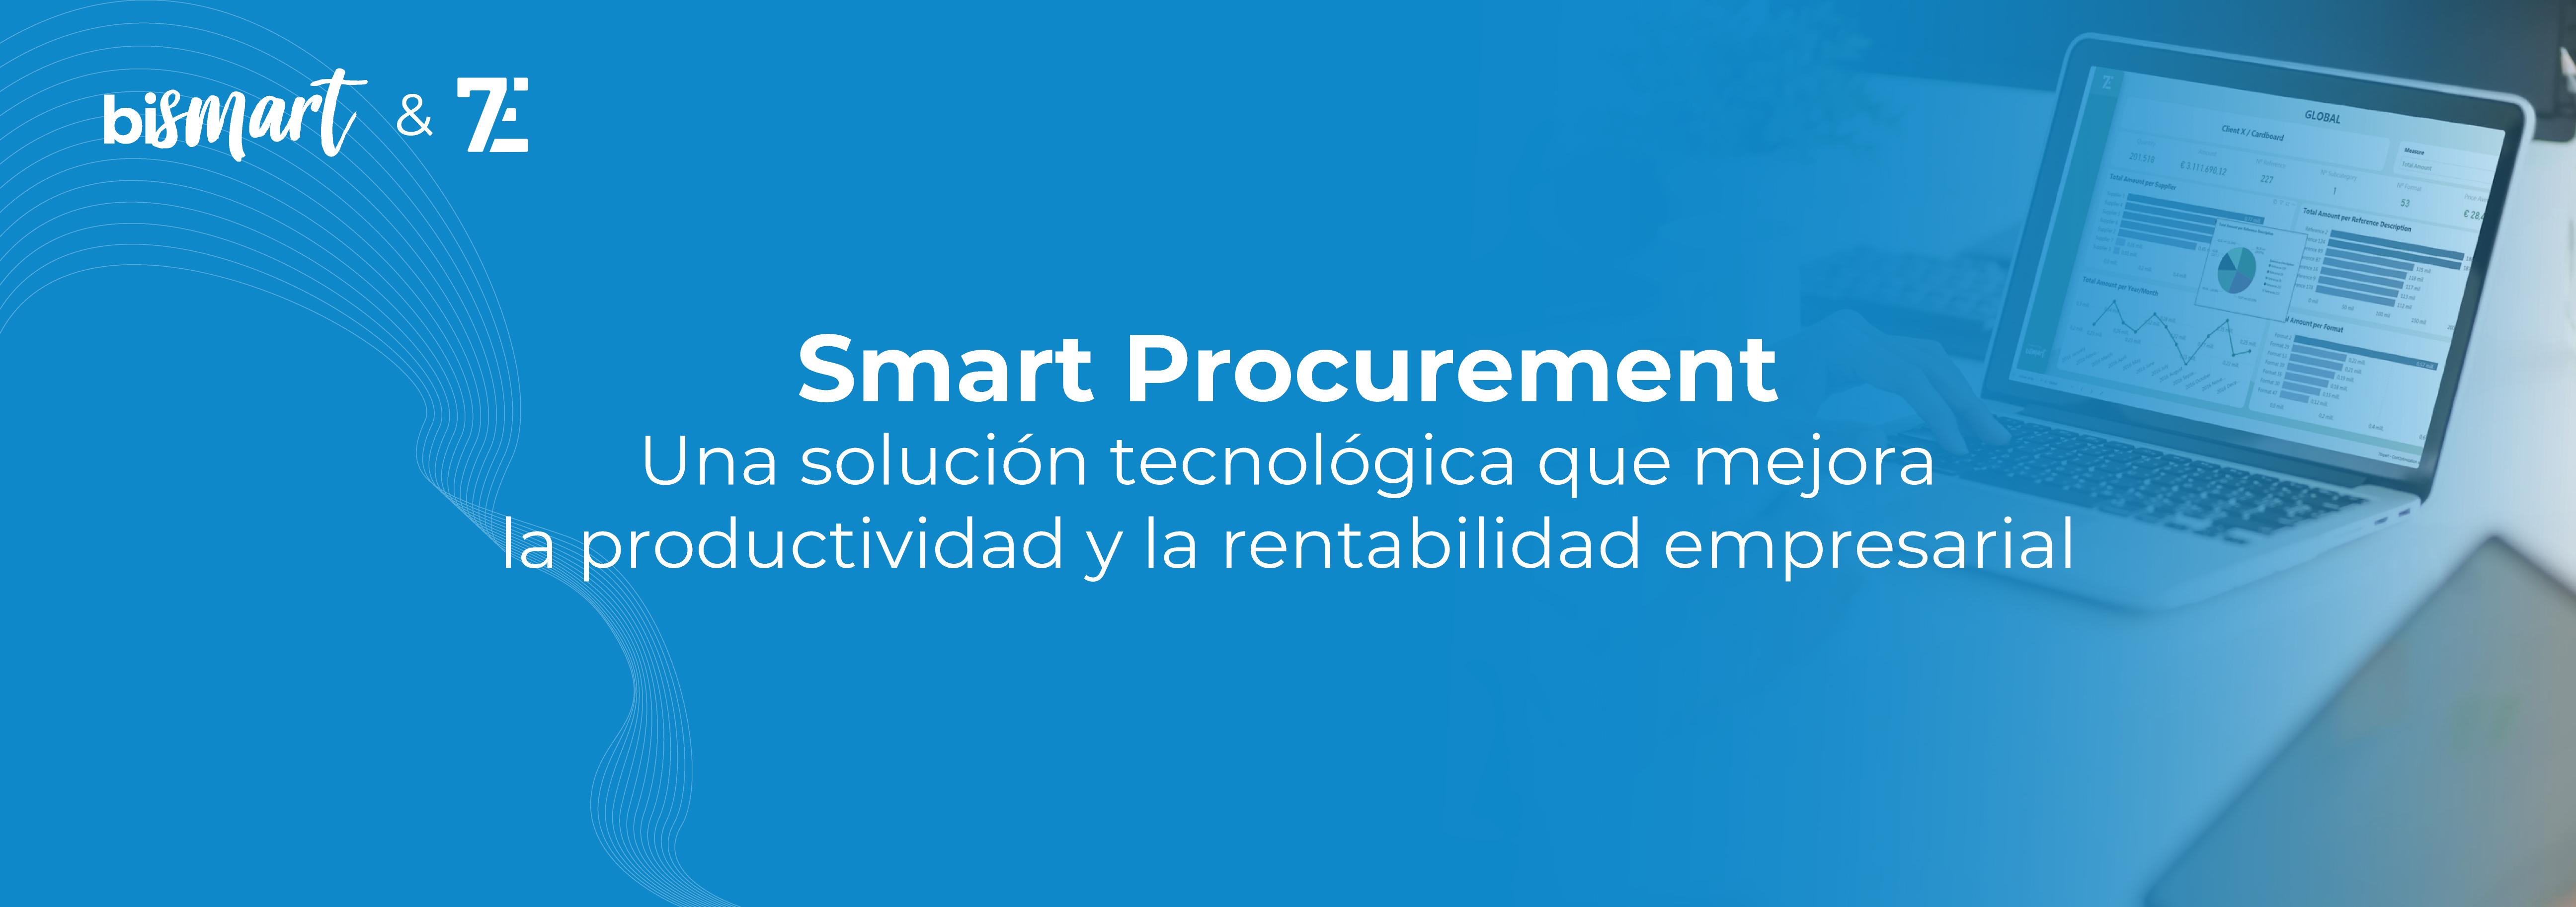 7Experts-Smart-Procurement-Landing-01